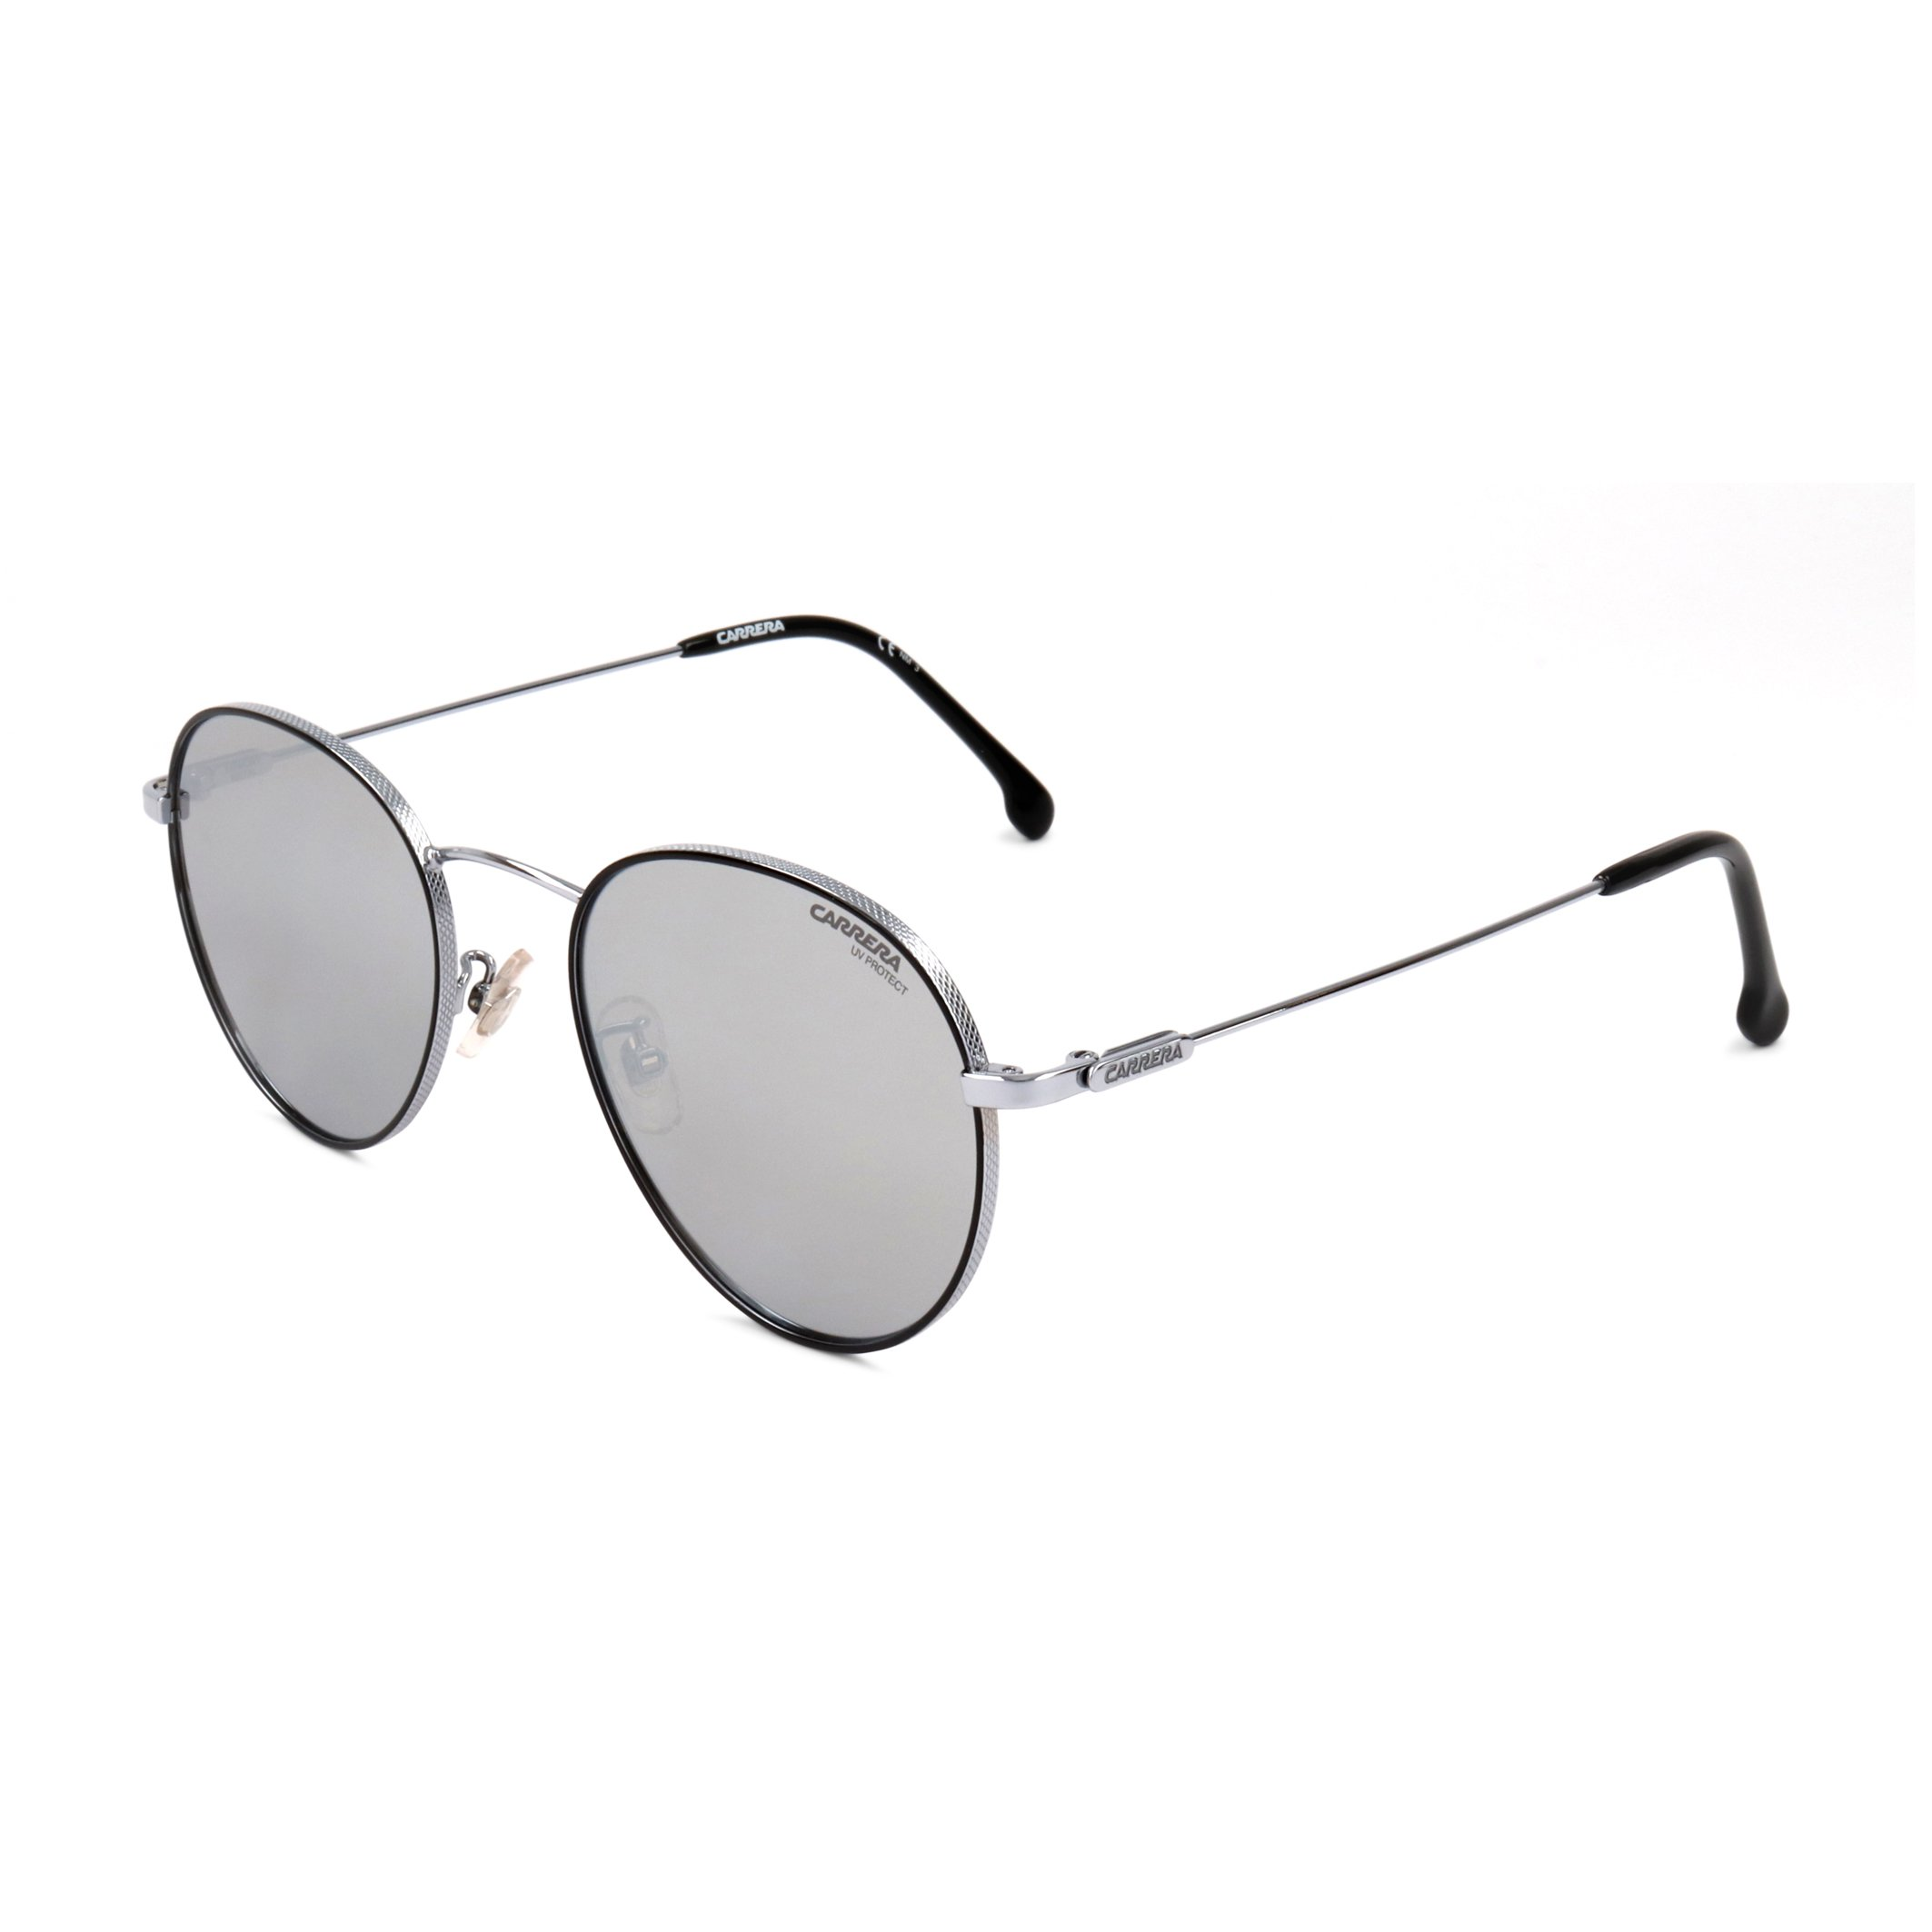 Carrera Unisex Sunglasses Various Colours 216GS - black NOSIZE